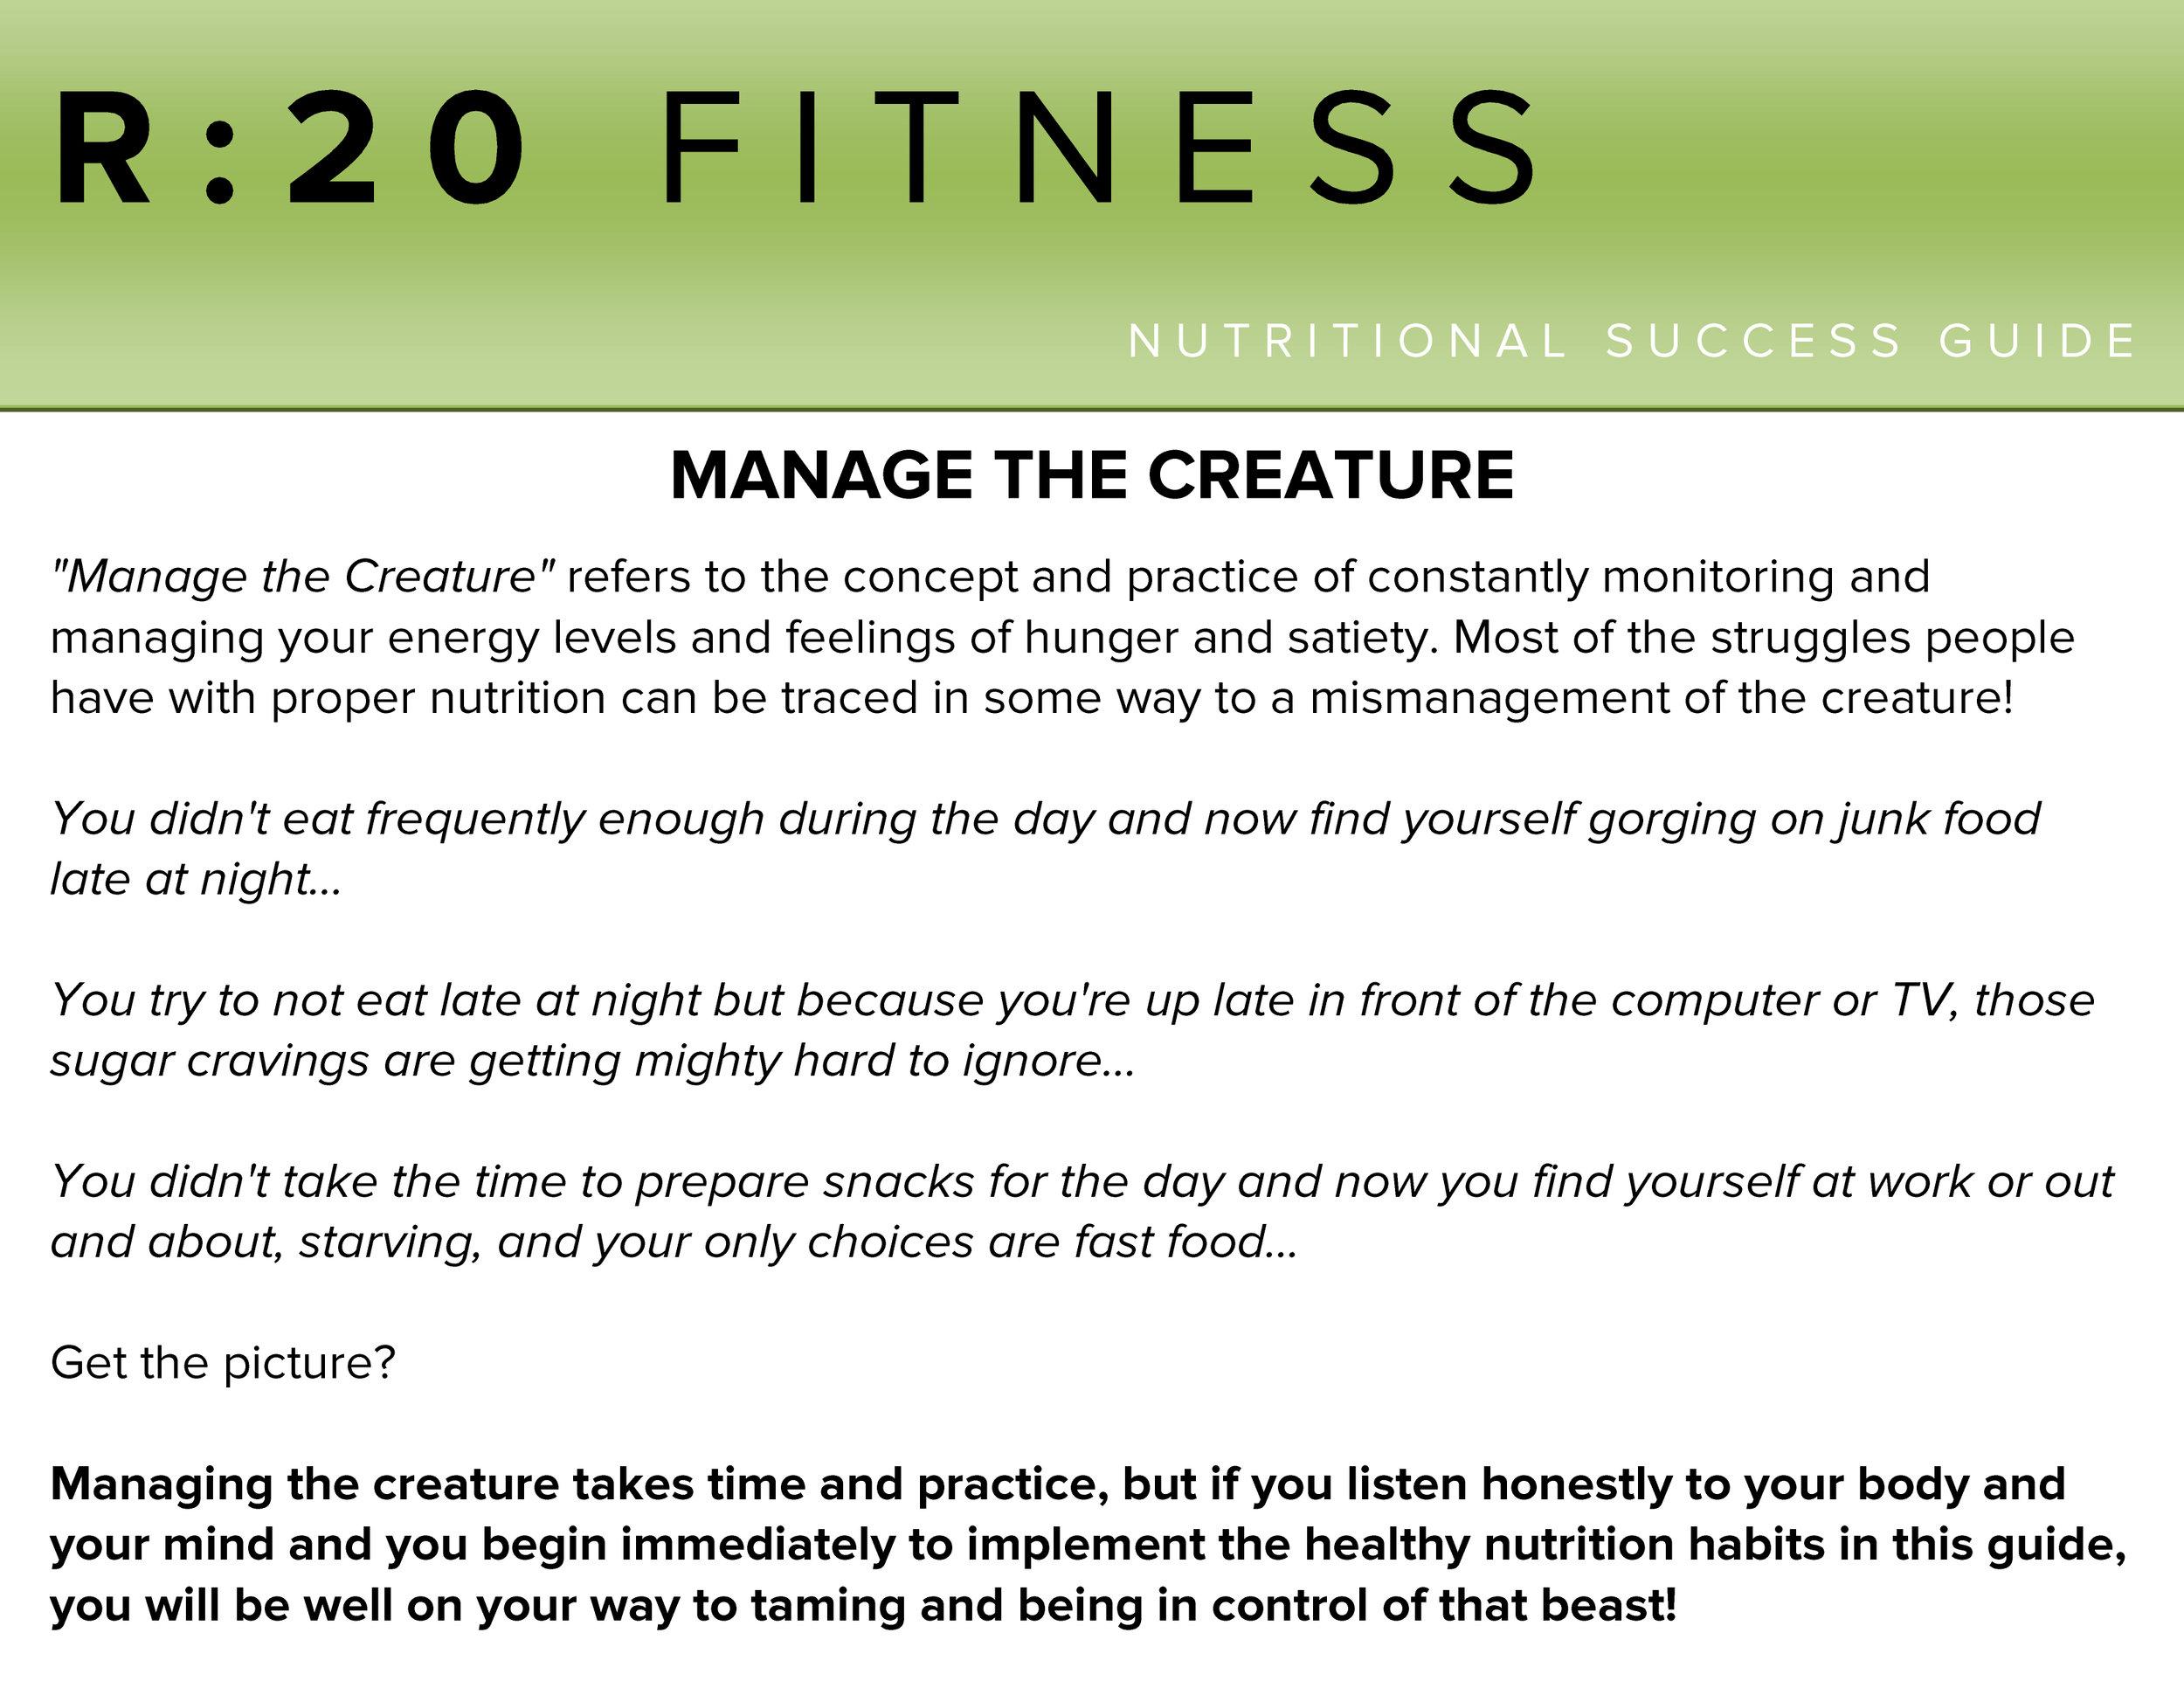 R20 1.0 Nutritional Success Guide-4.jpg